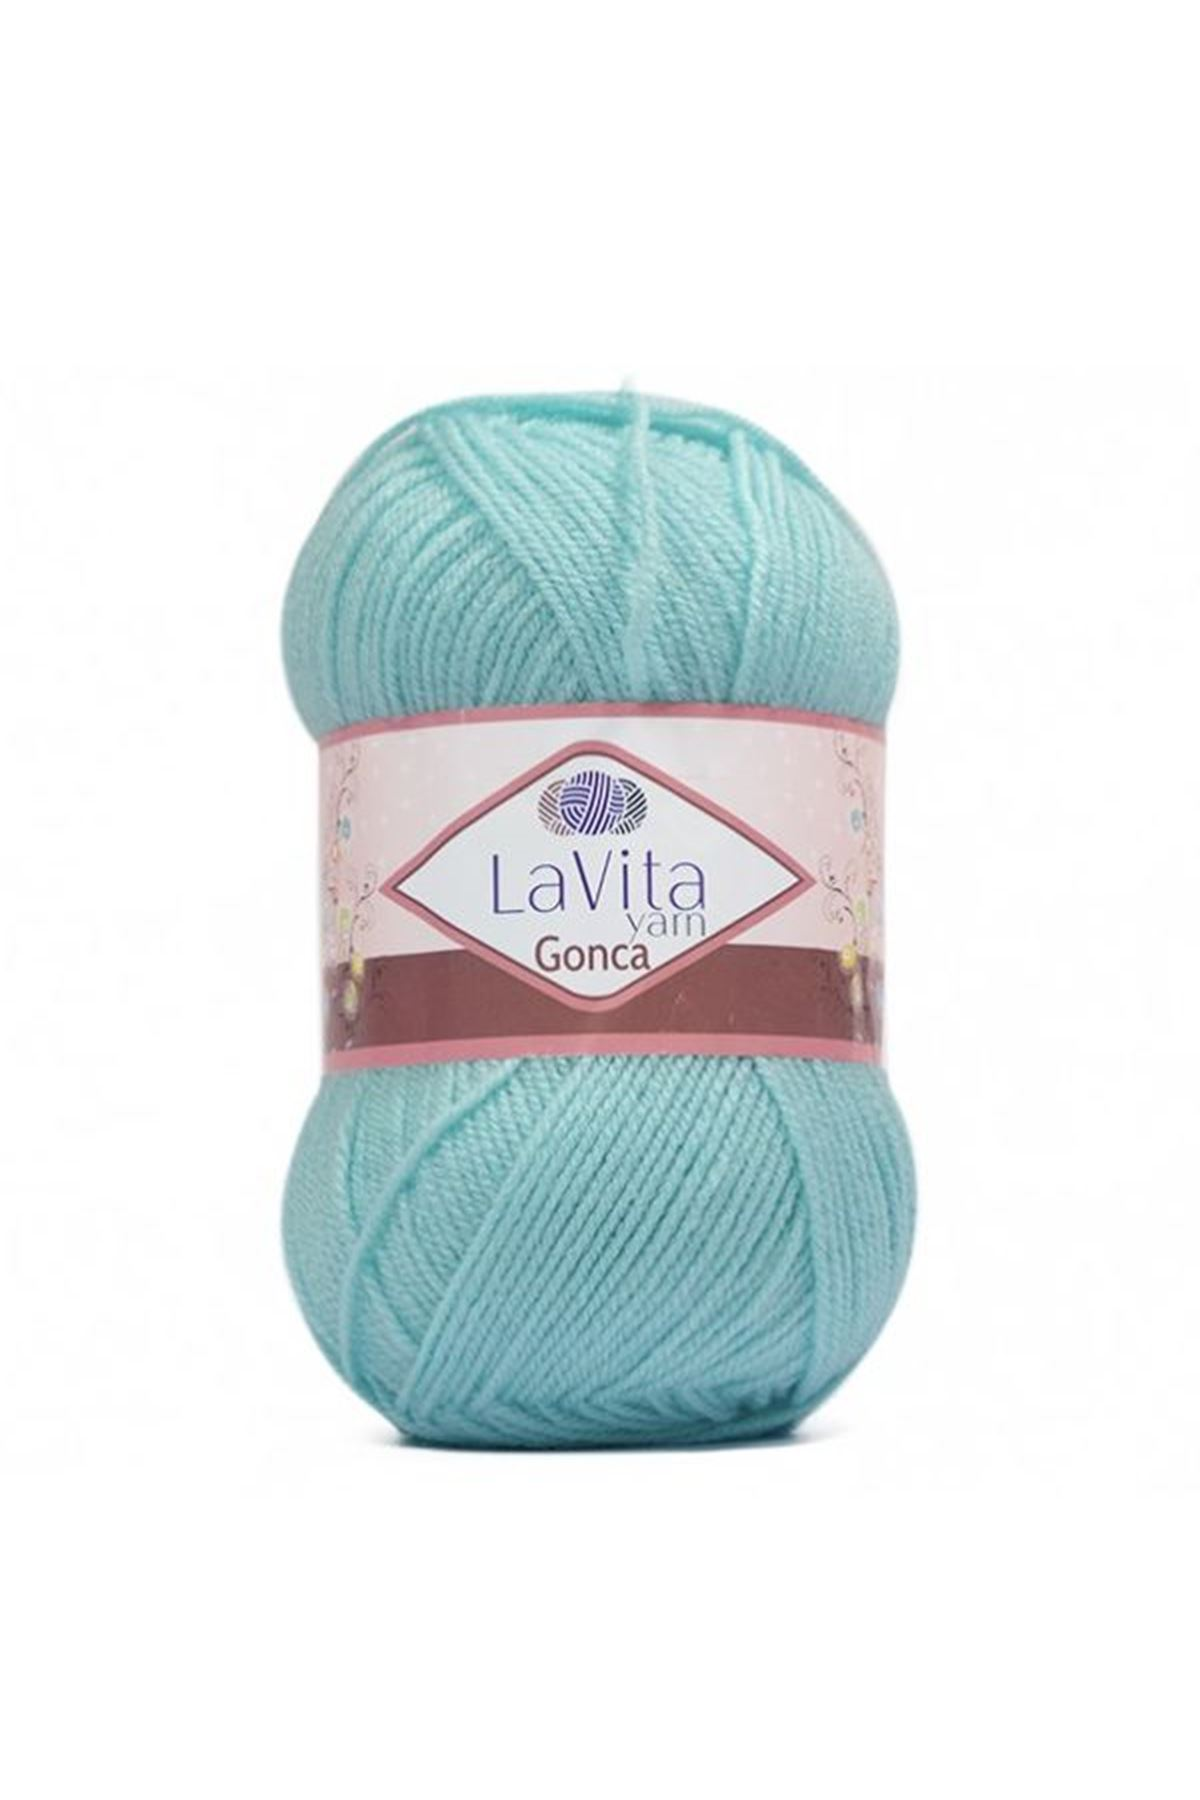 Lavita Gonca 5027 Nil Yeşili